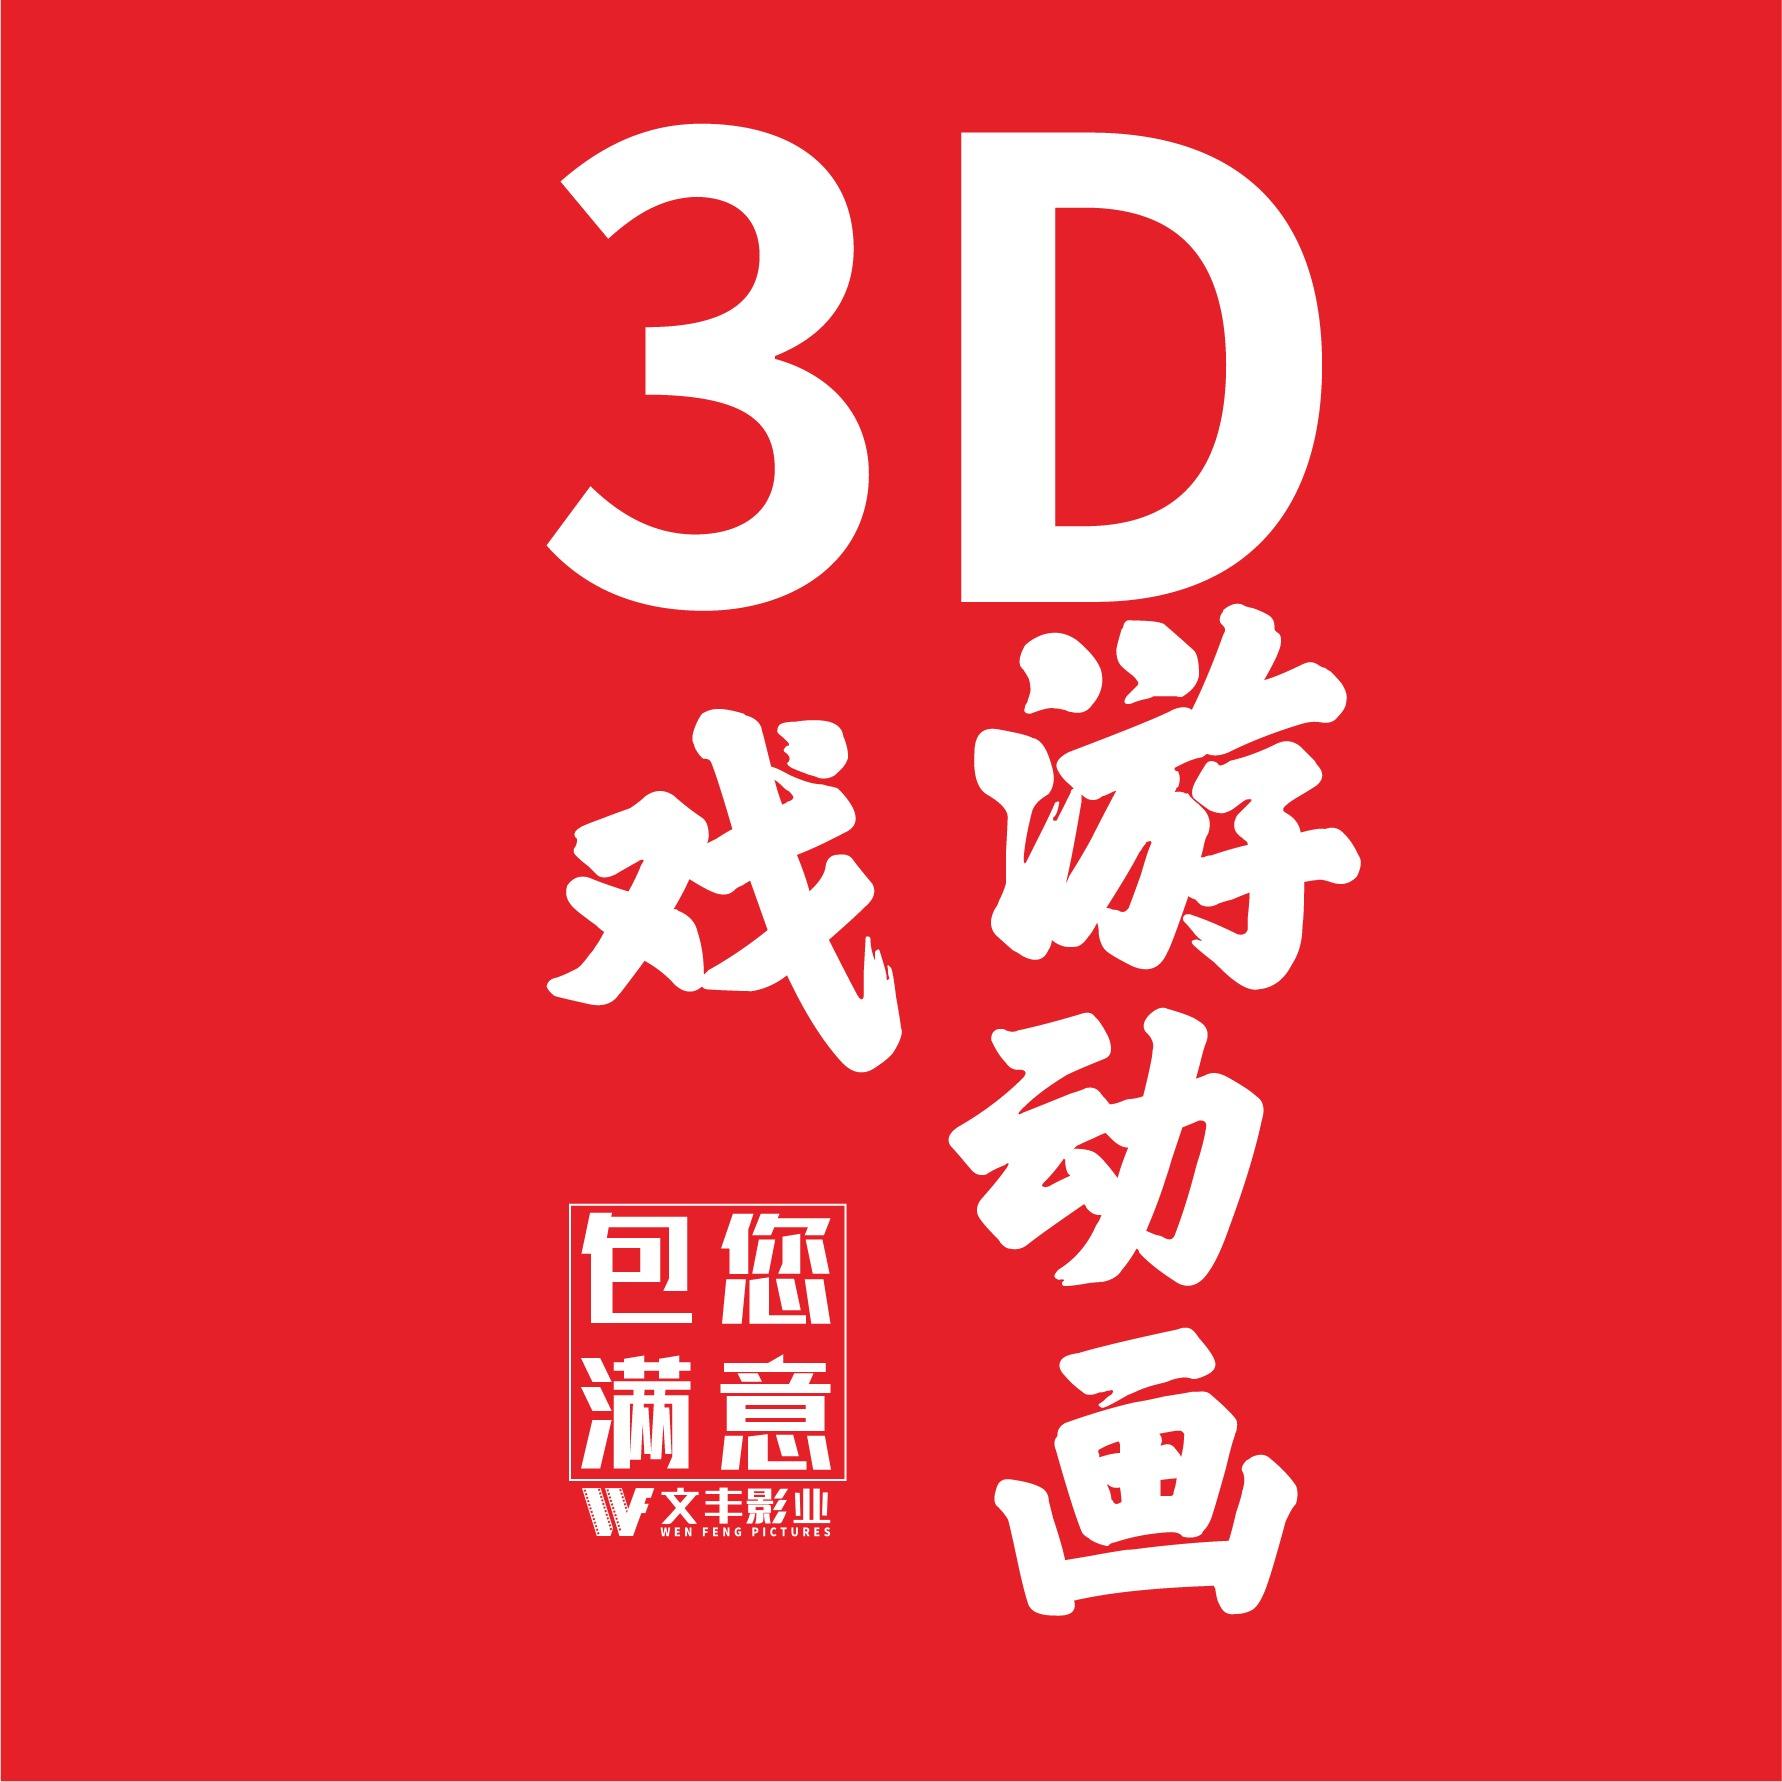 【3d动画制作】三维模型制作/三维特效元素制作